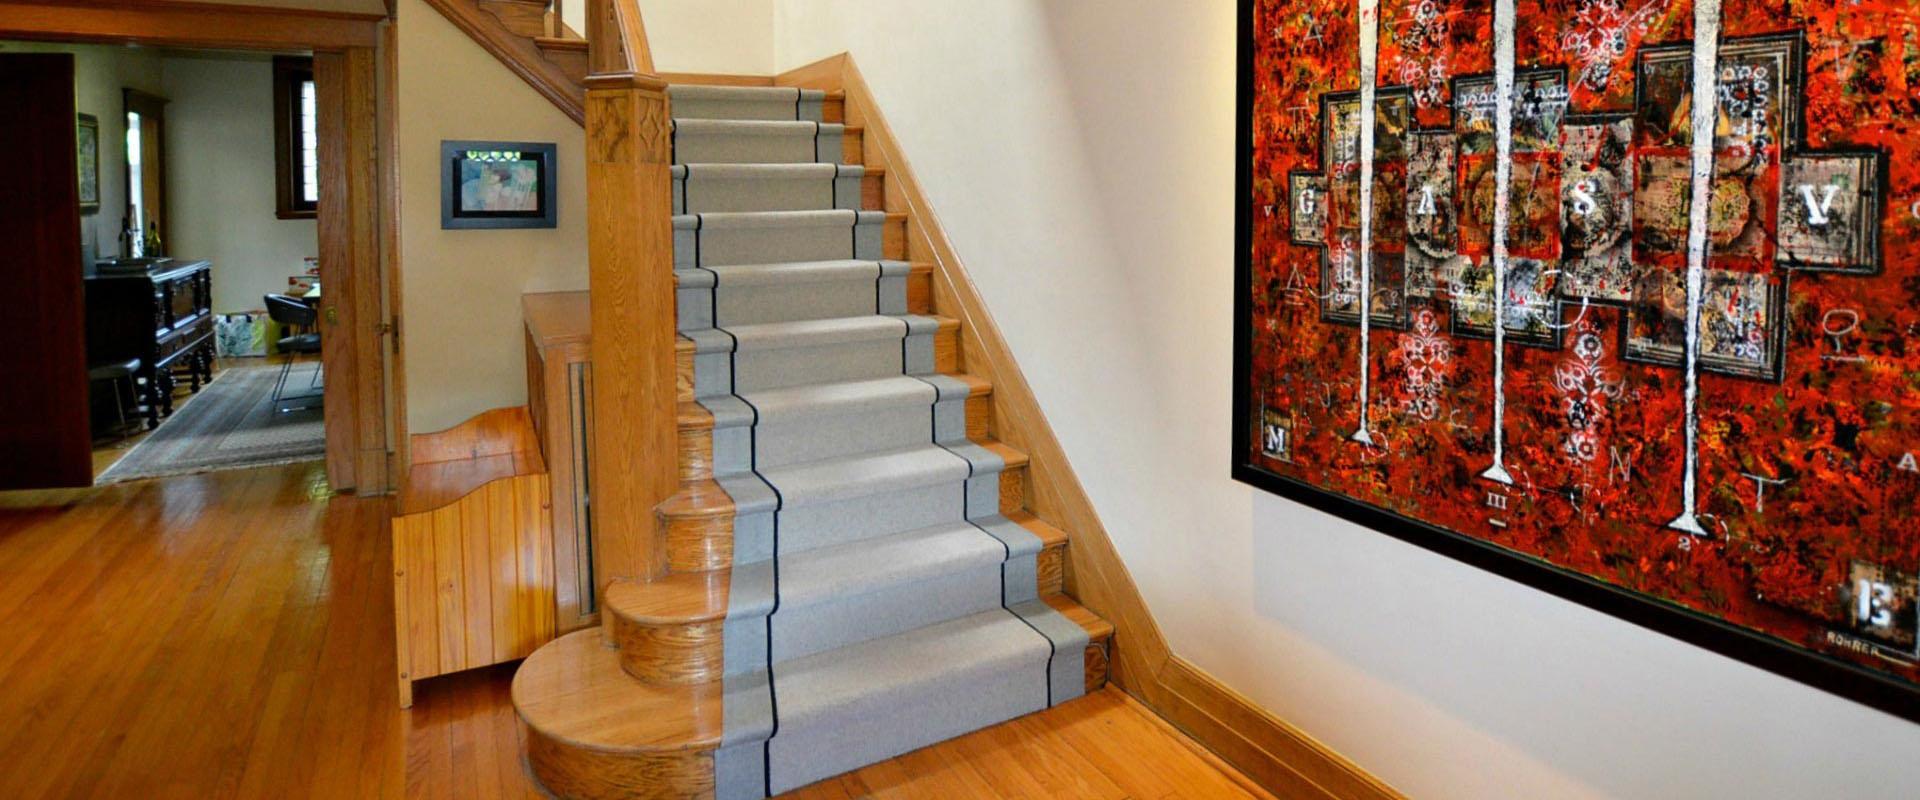 chemin-escalier-diapo-image-1